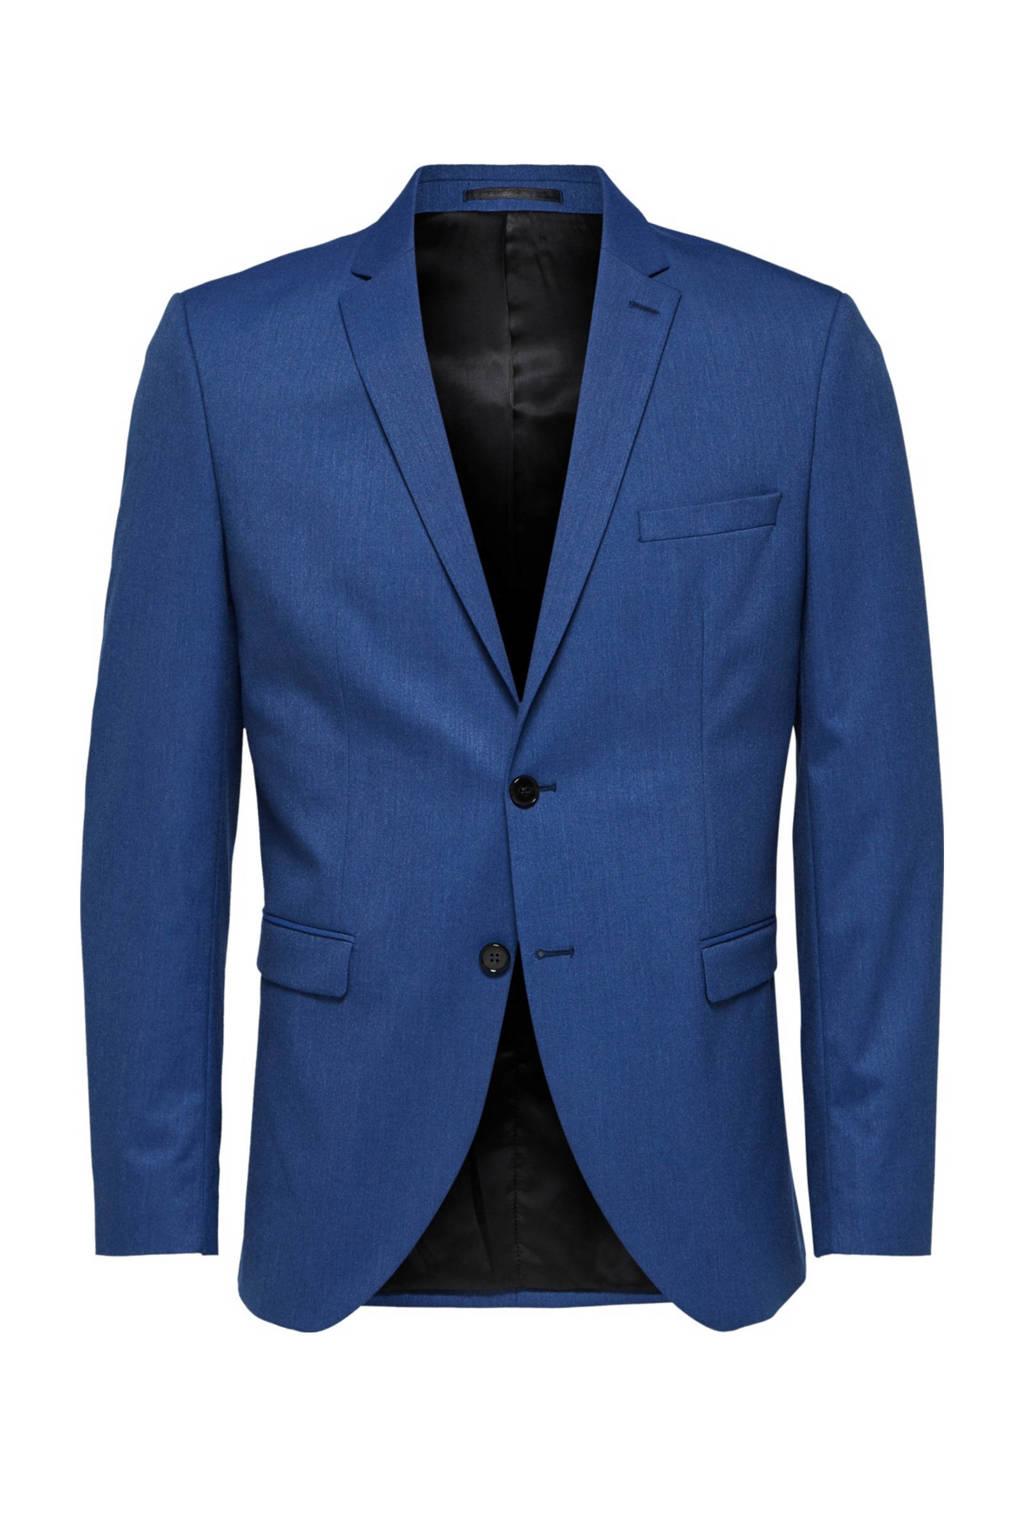 SELECTED HOMME slim fit colbert blauw, Blauw